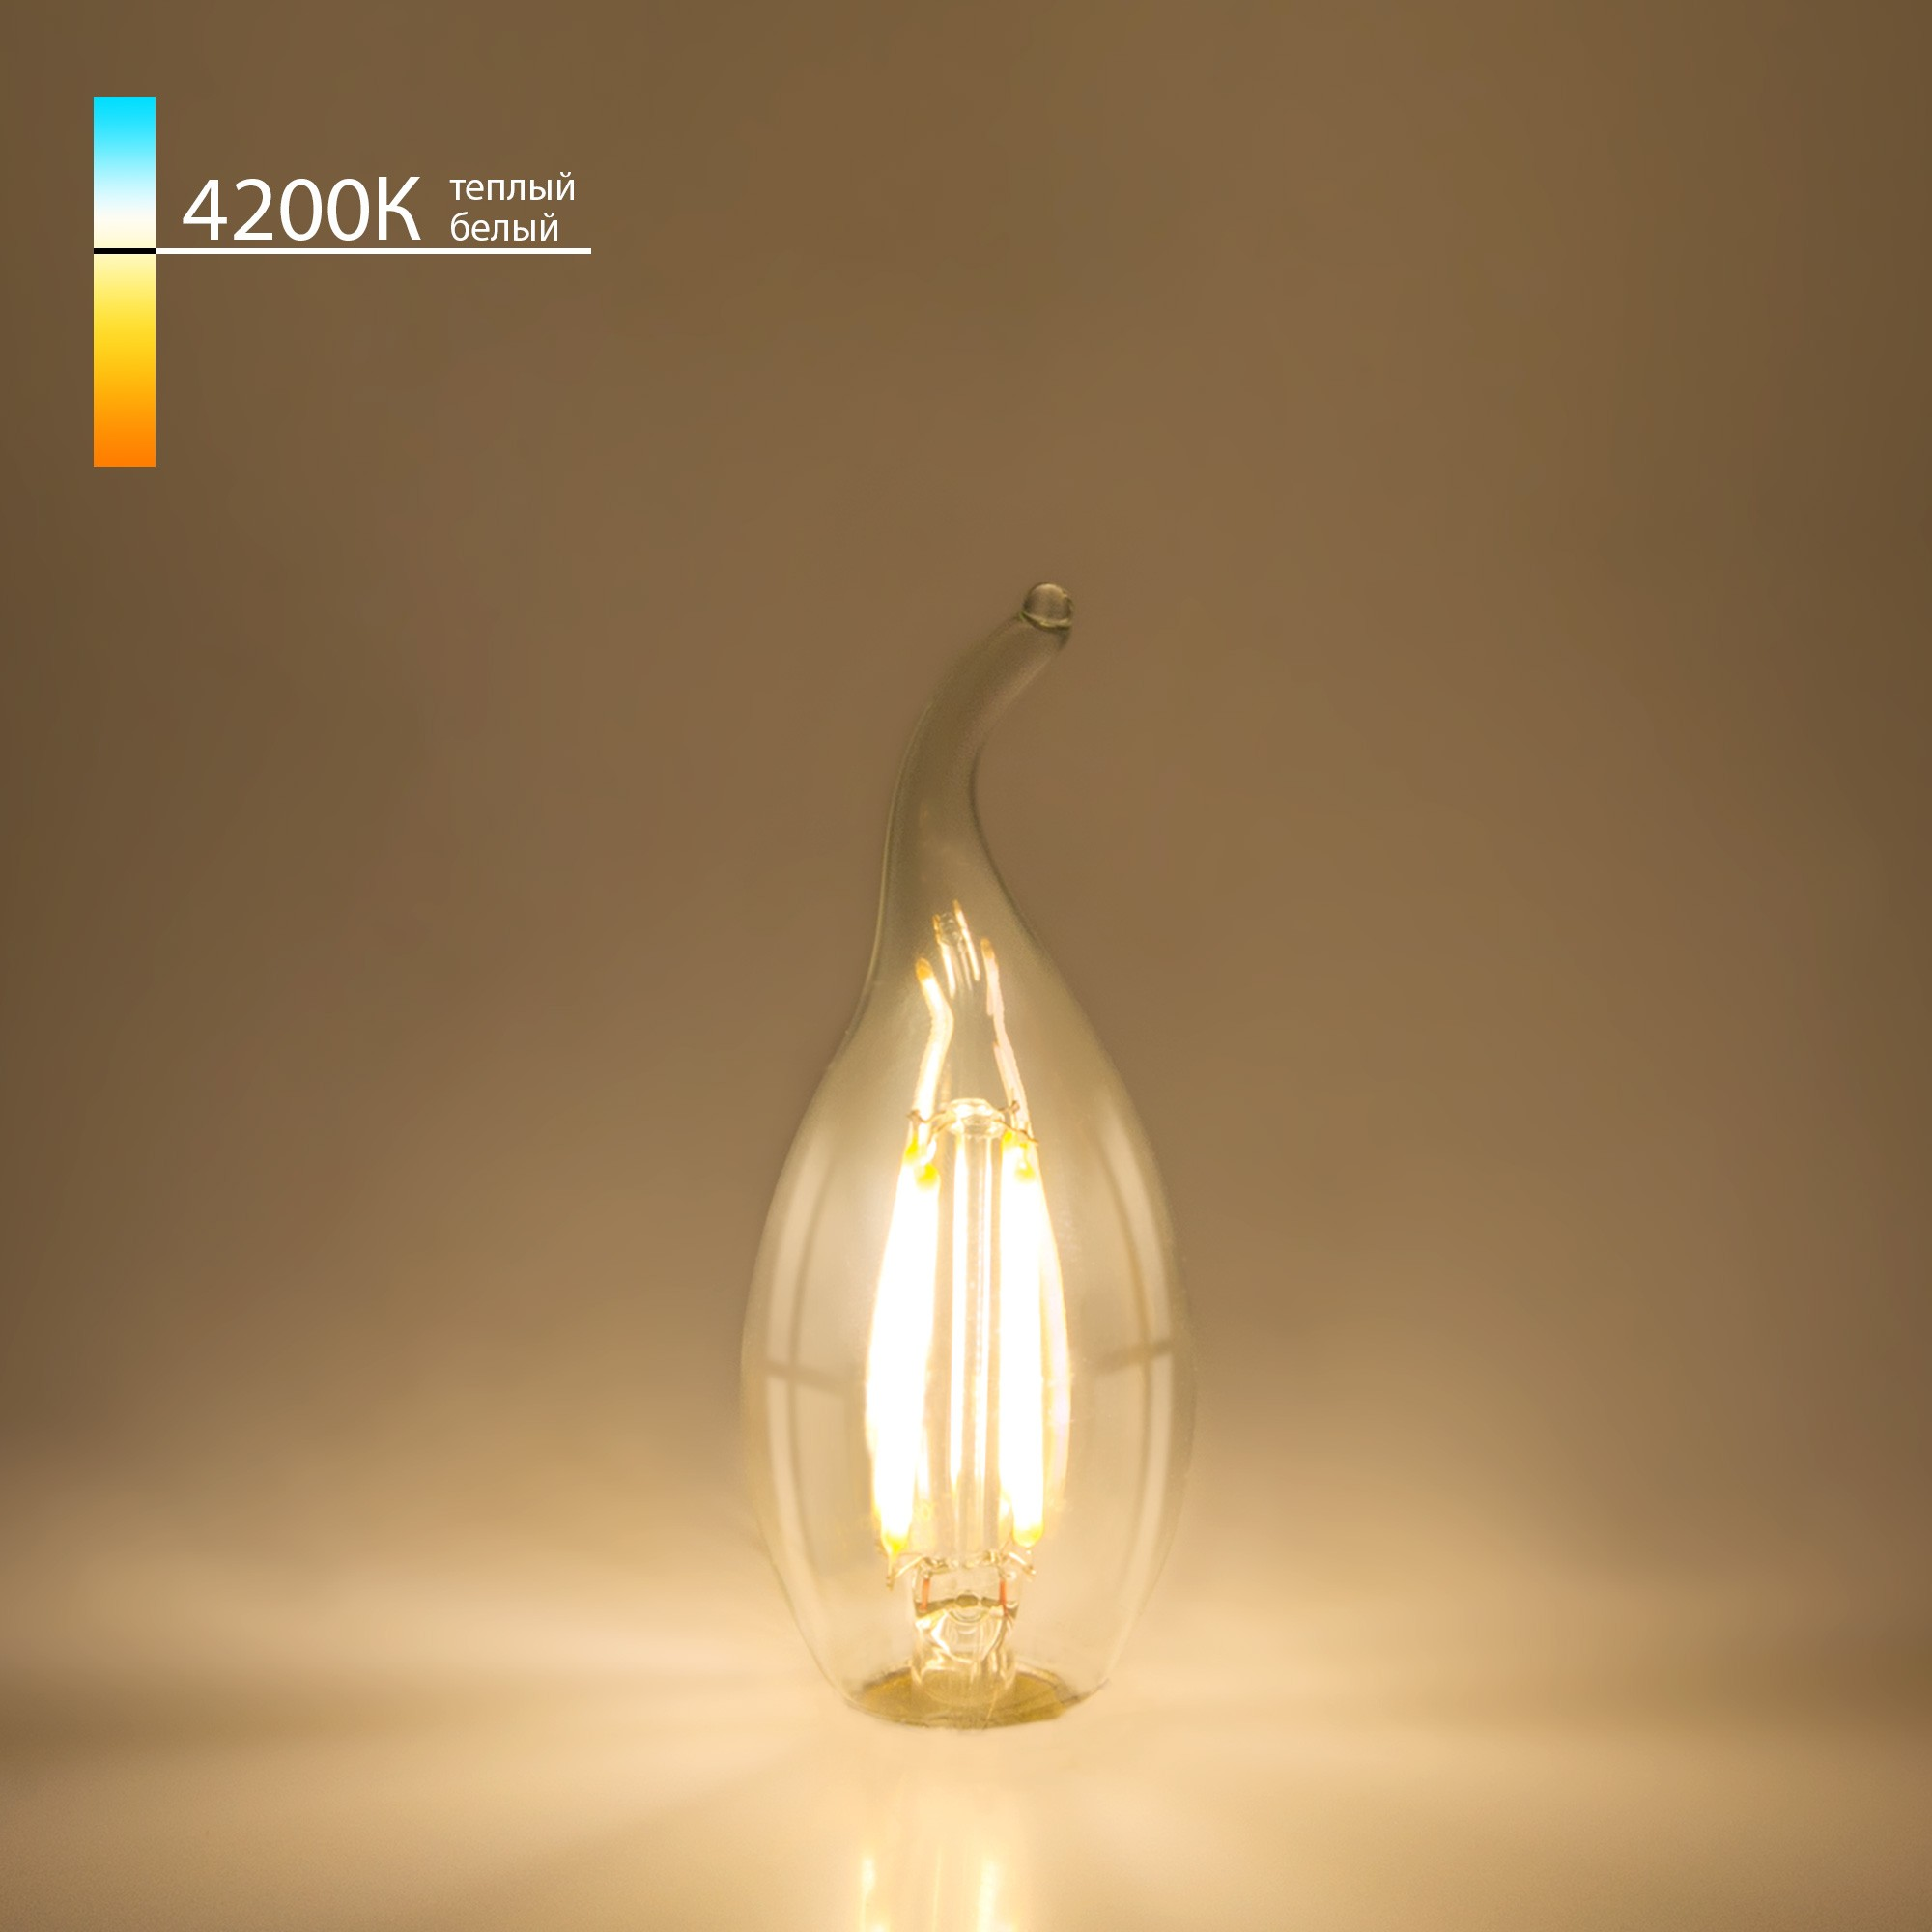 Свеча на ветру BLE1429 9W 4200K E14 (CW35 прозрачный)